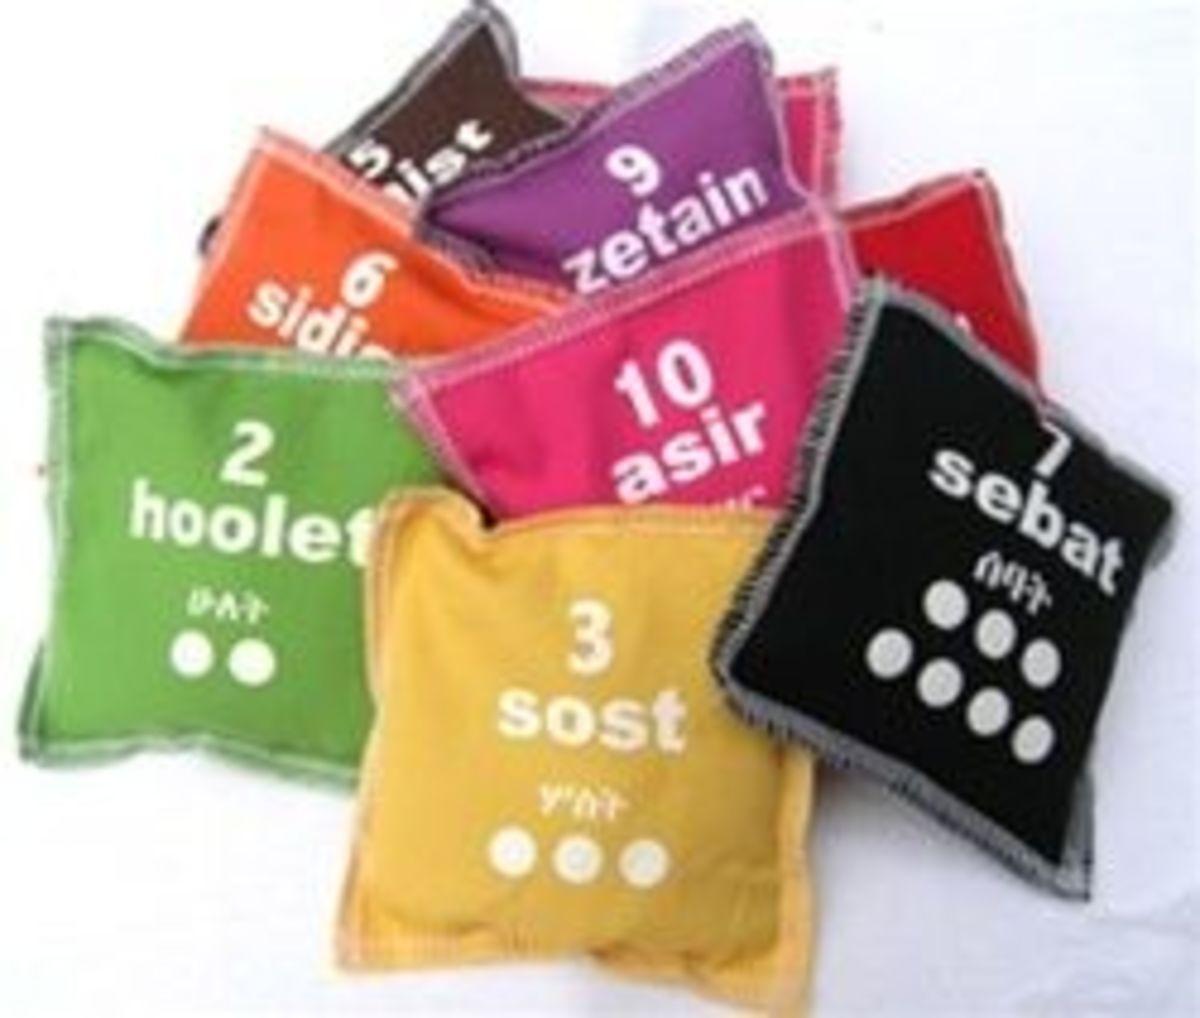 Amharic Bean Bag Learning tools